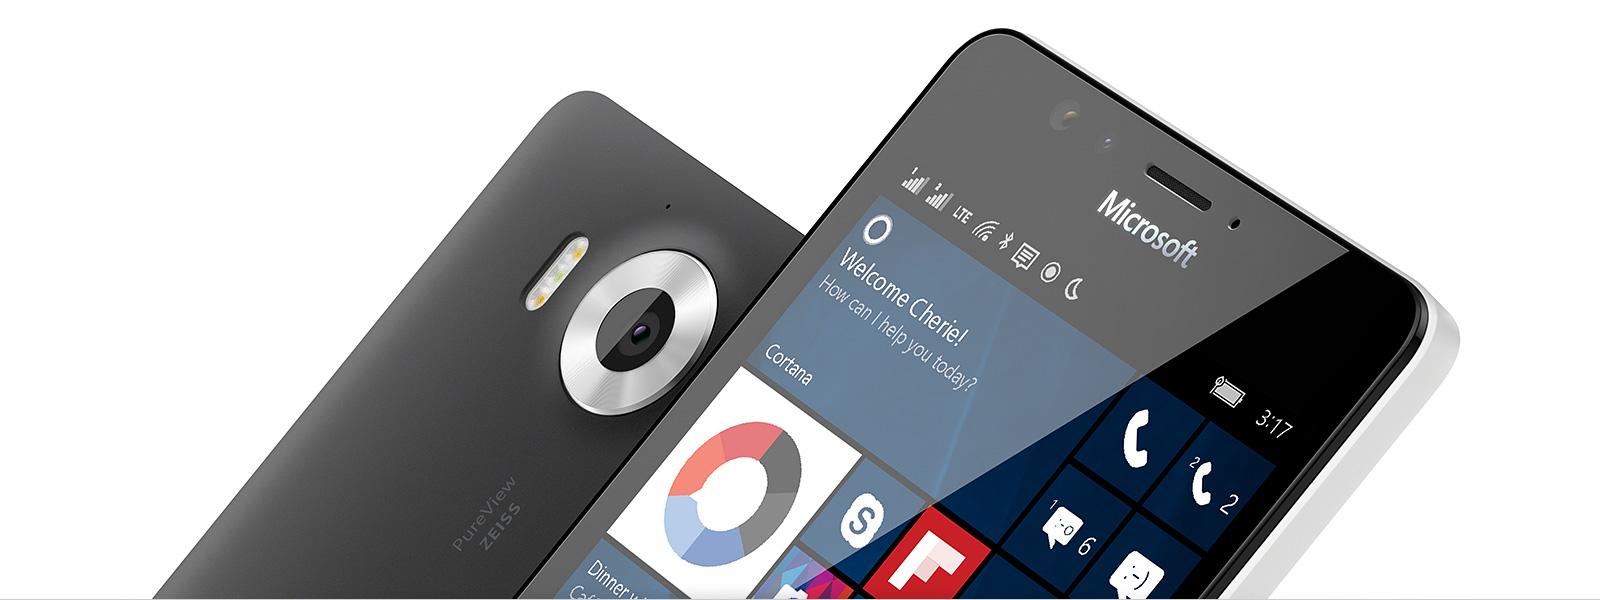 Windows 10 Mobile-telefoons